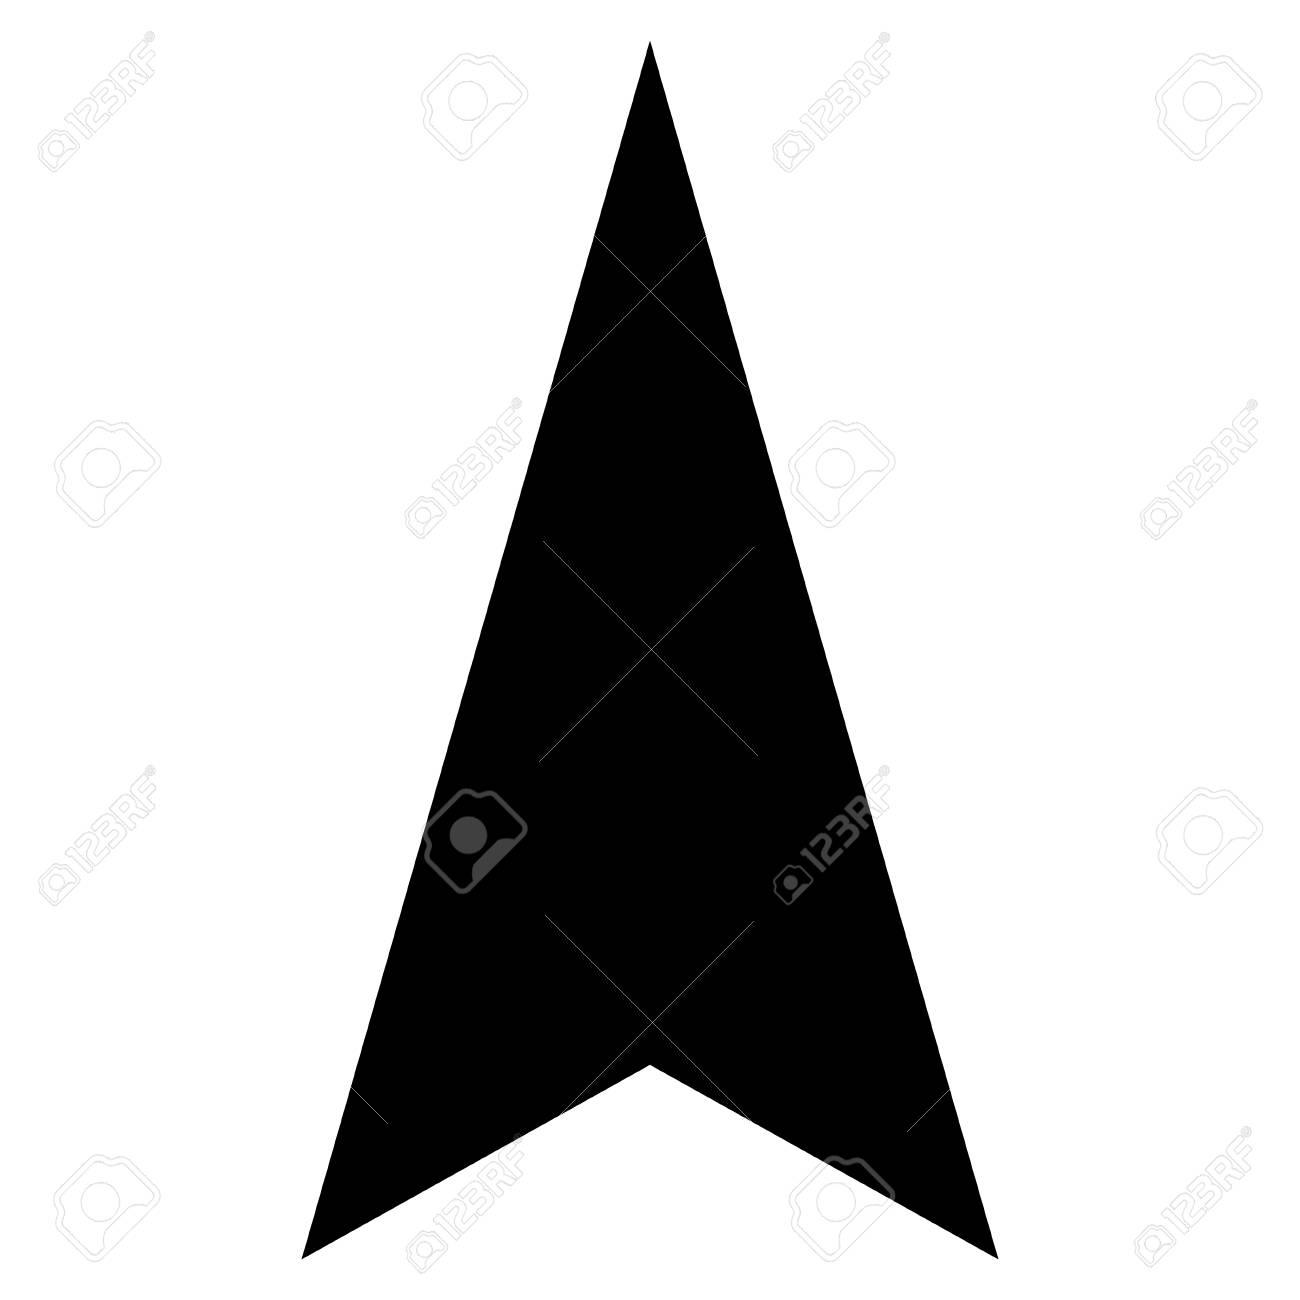 arrowhead up vector icon style is flat icon symbol black color rh 123rf com arrowhead vector black arrowhead vector graphic